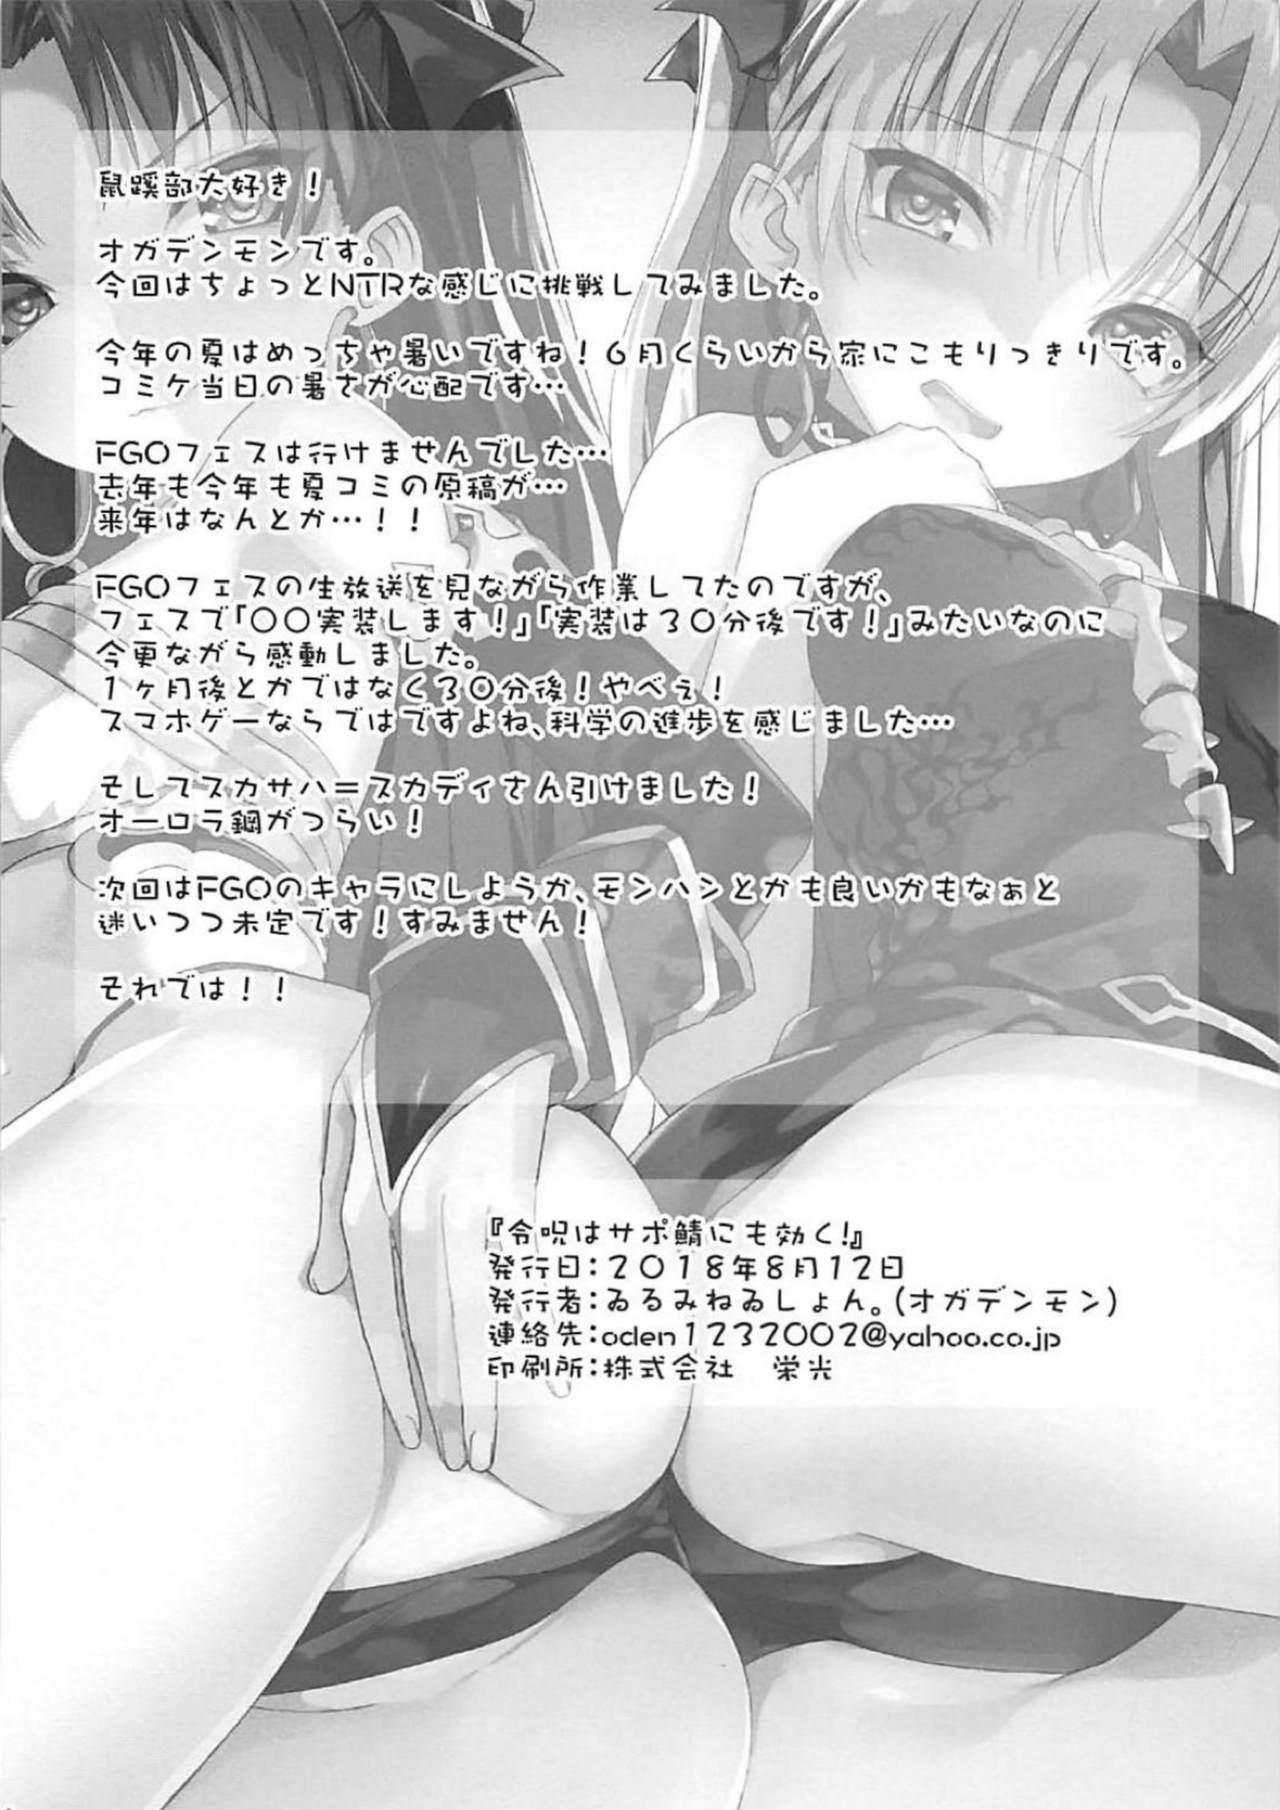 Reiju wa Suppo Server ni mo Kiku! | Command Seals Work on Supports Too 23